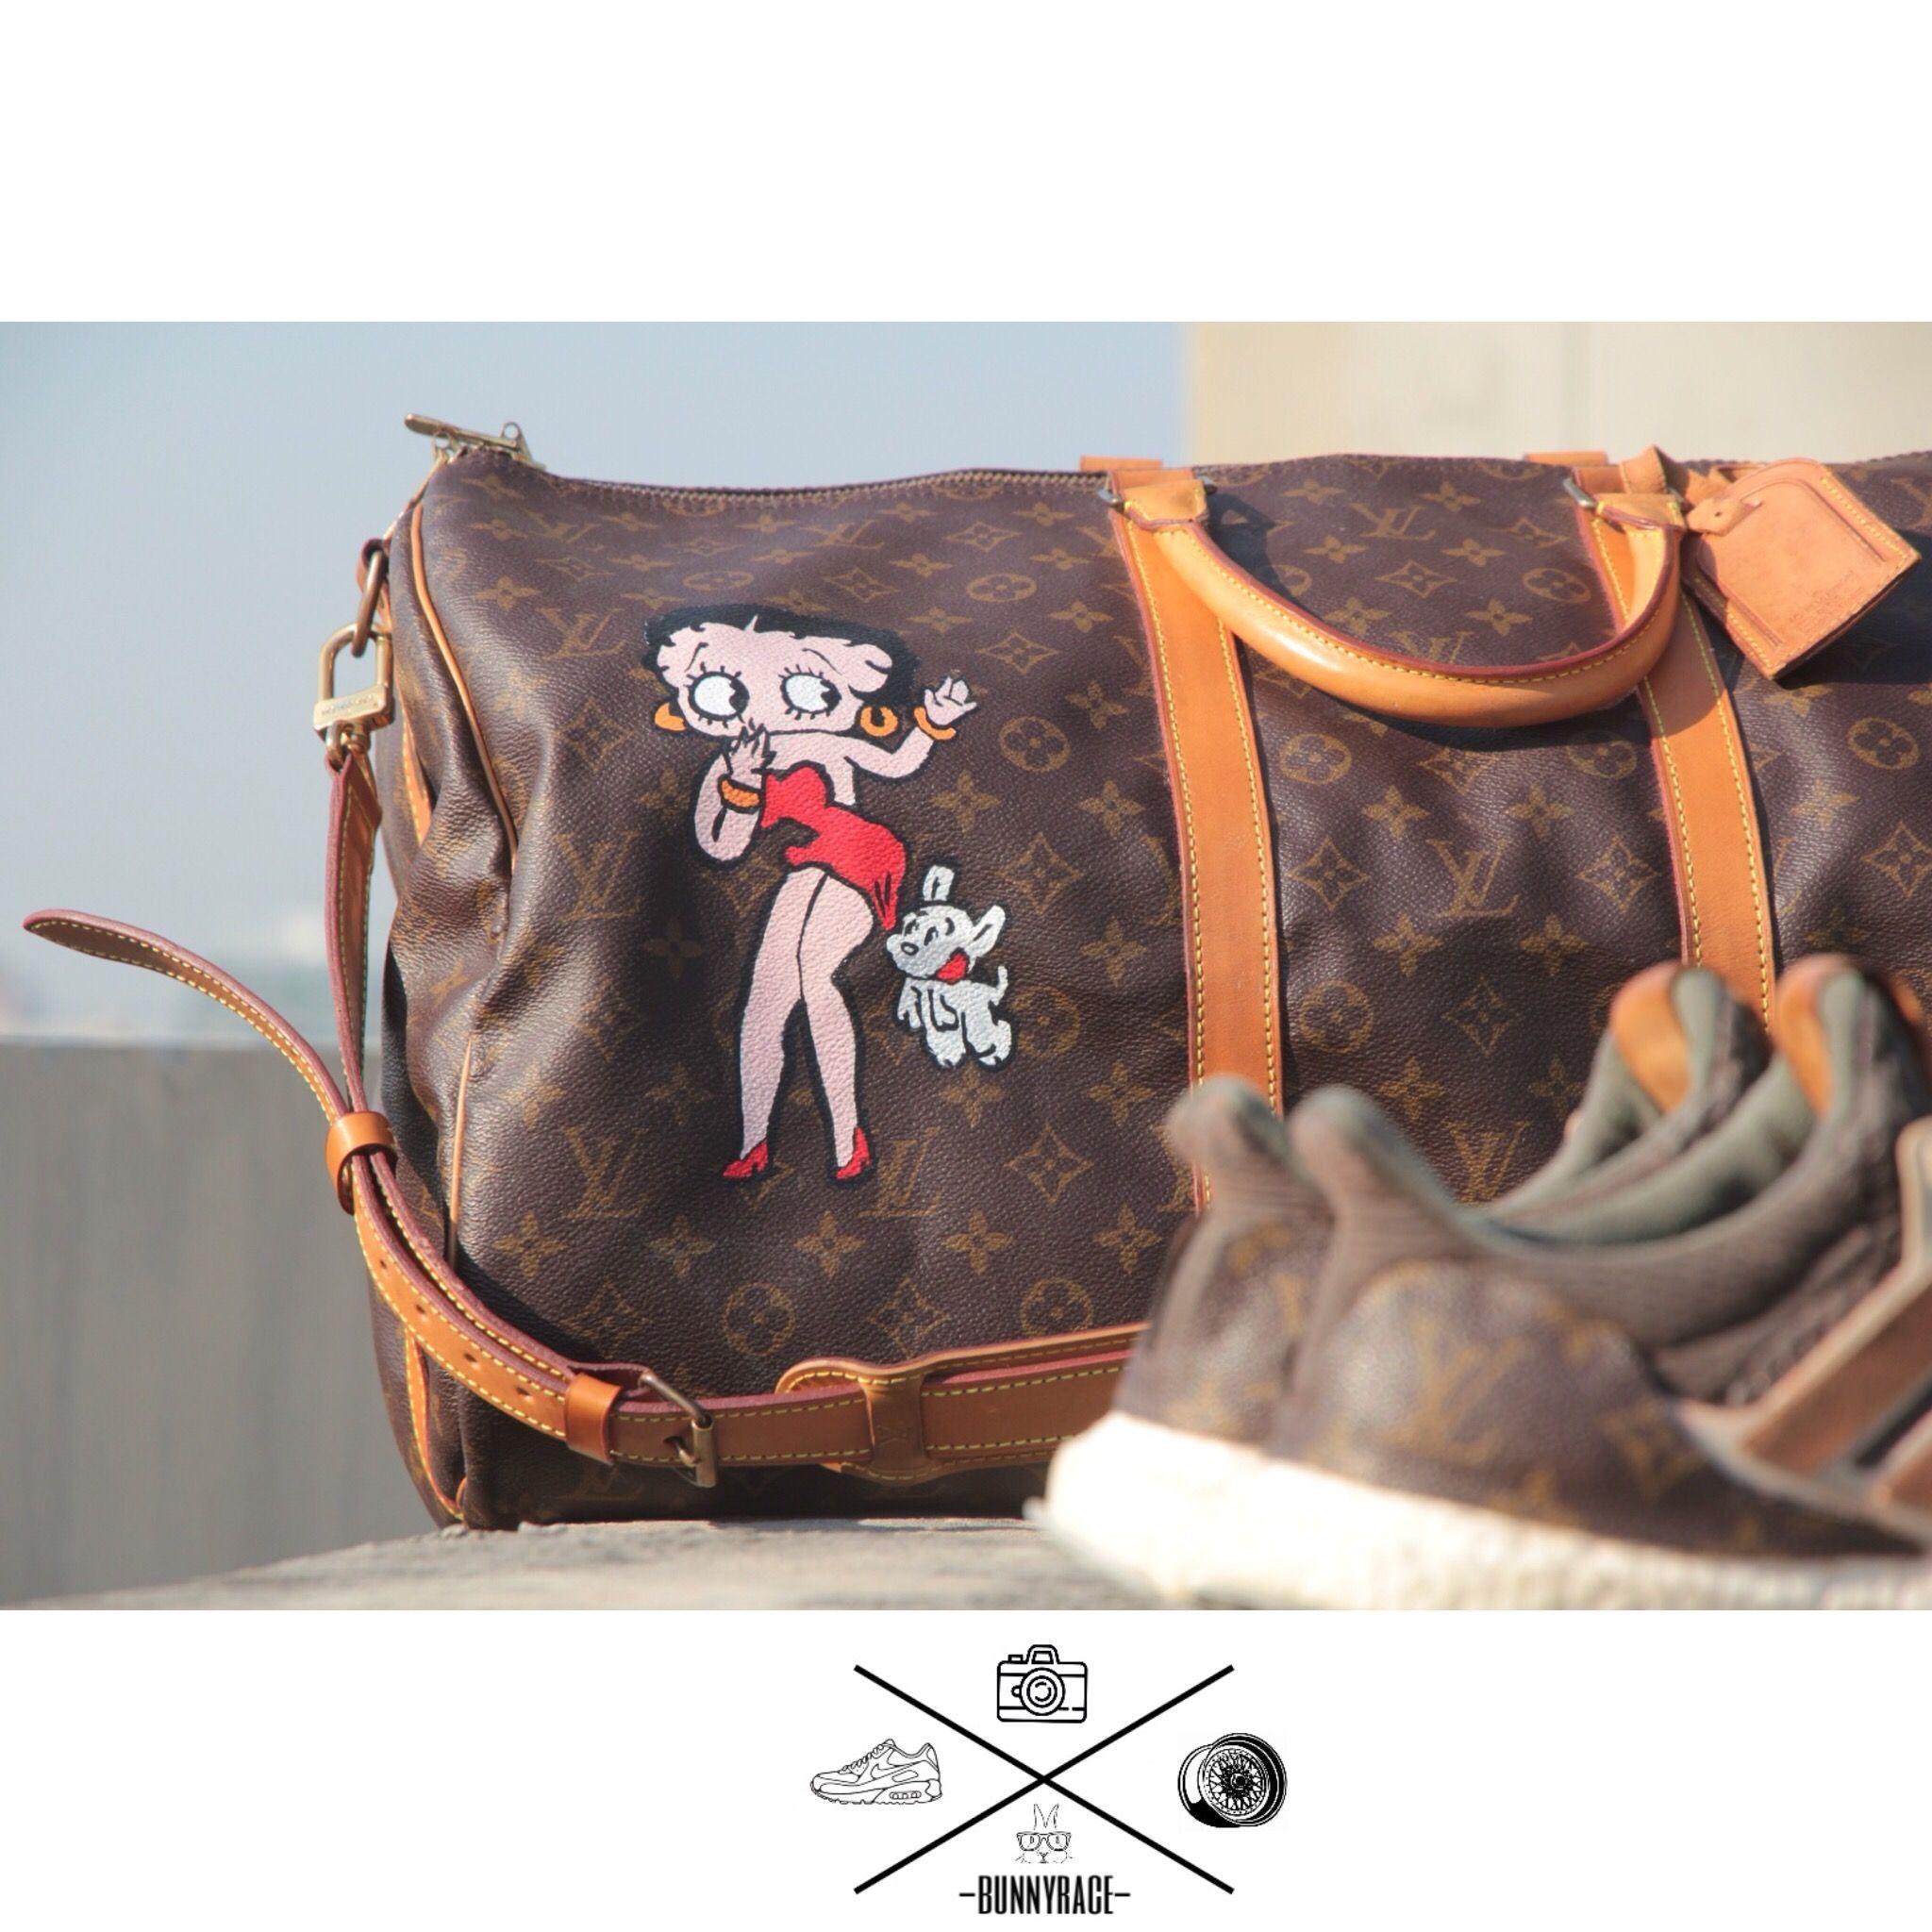 7018a496a0d Nice boston bag hands paint custom loved Betty Boop on Louis Vuitton ...